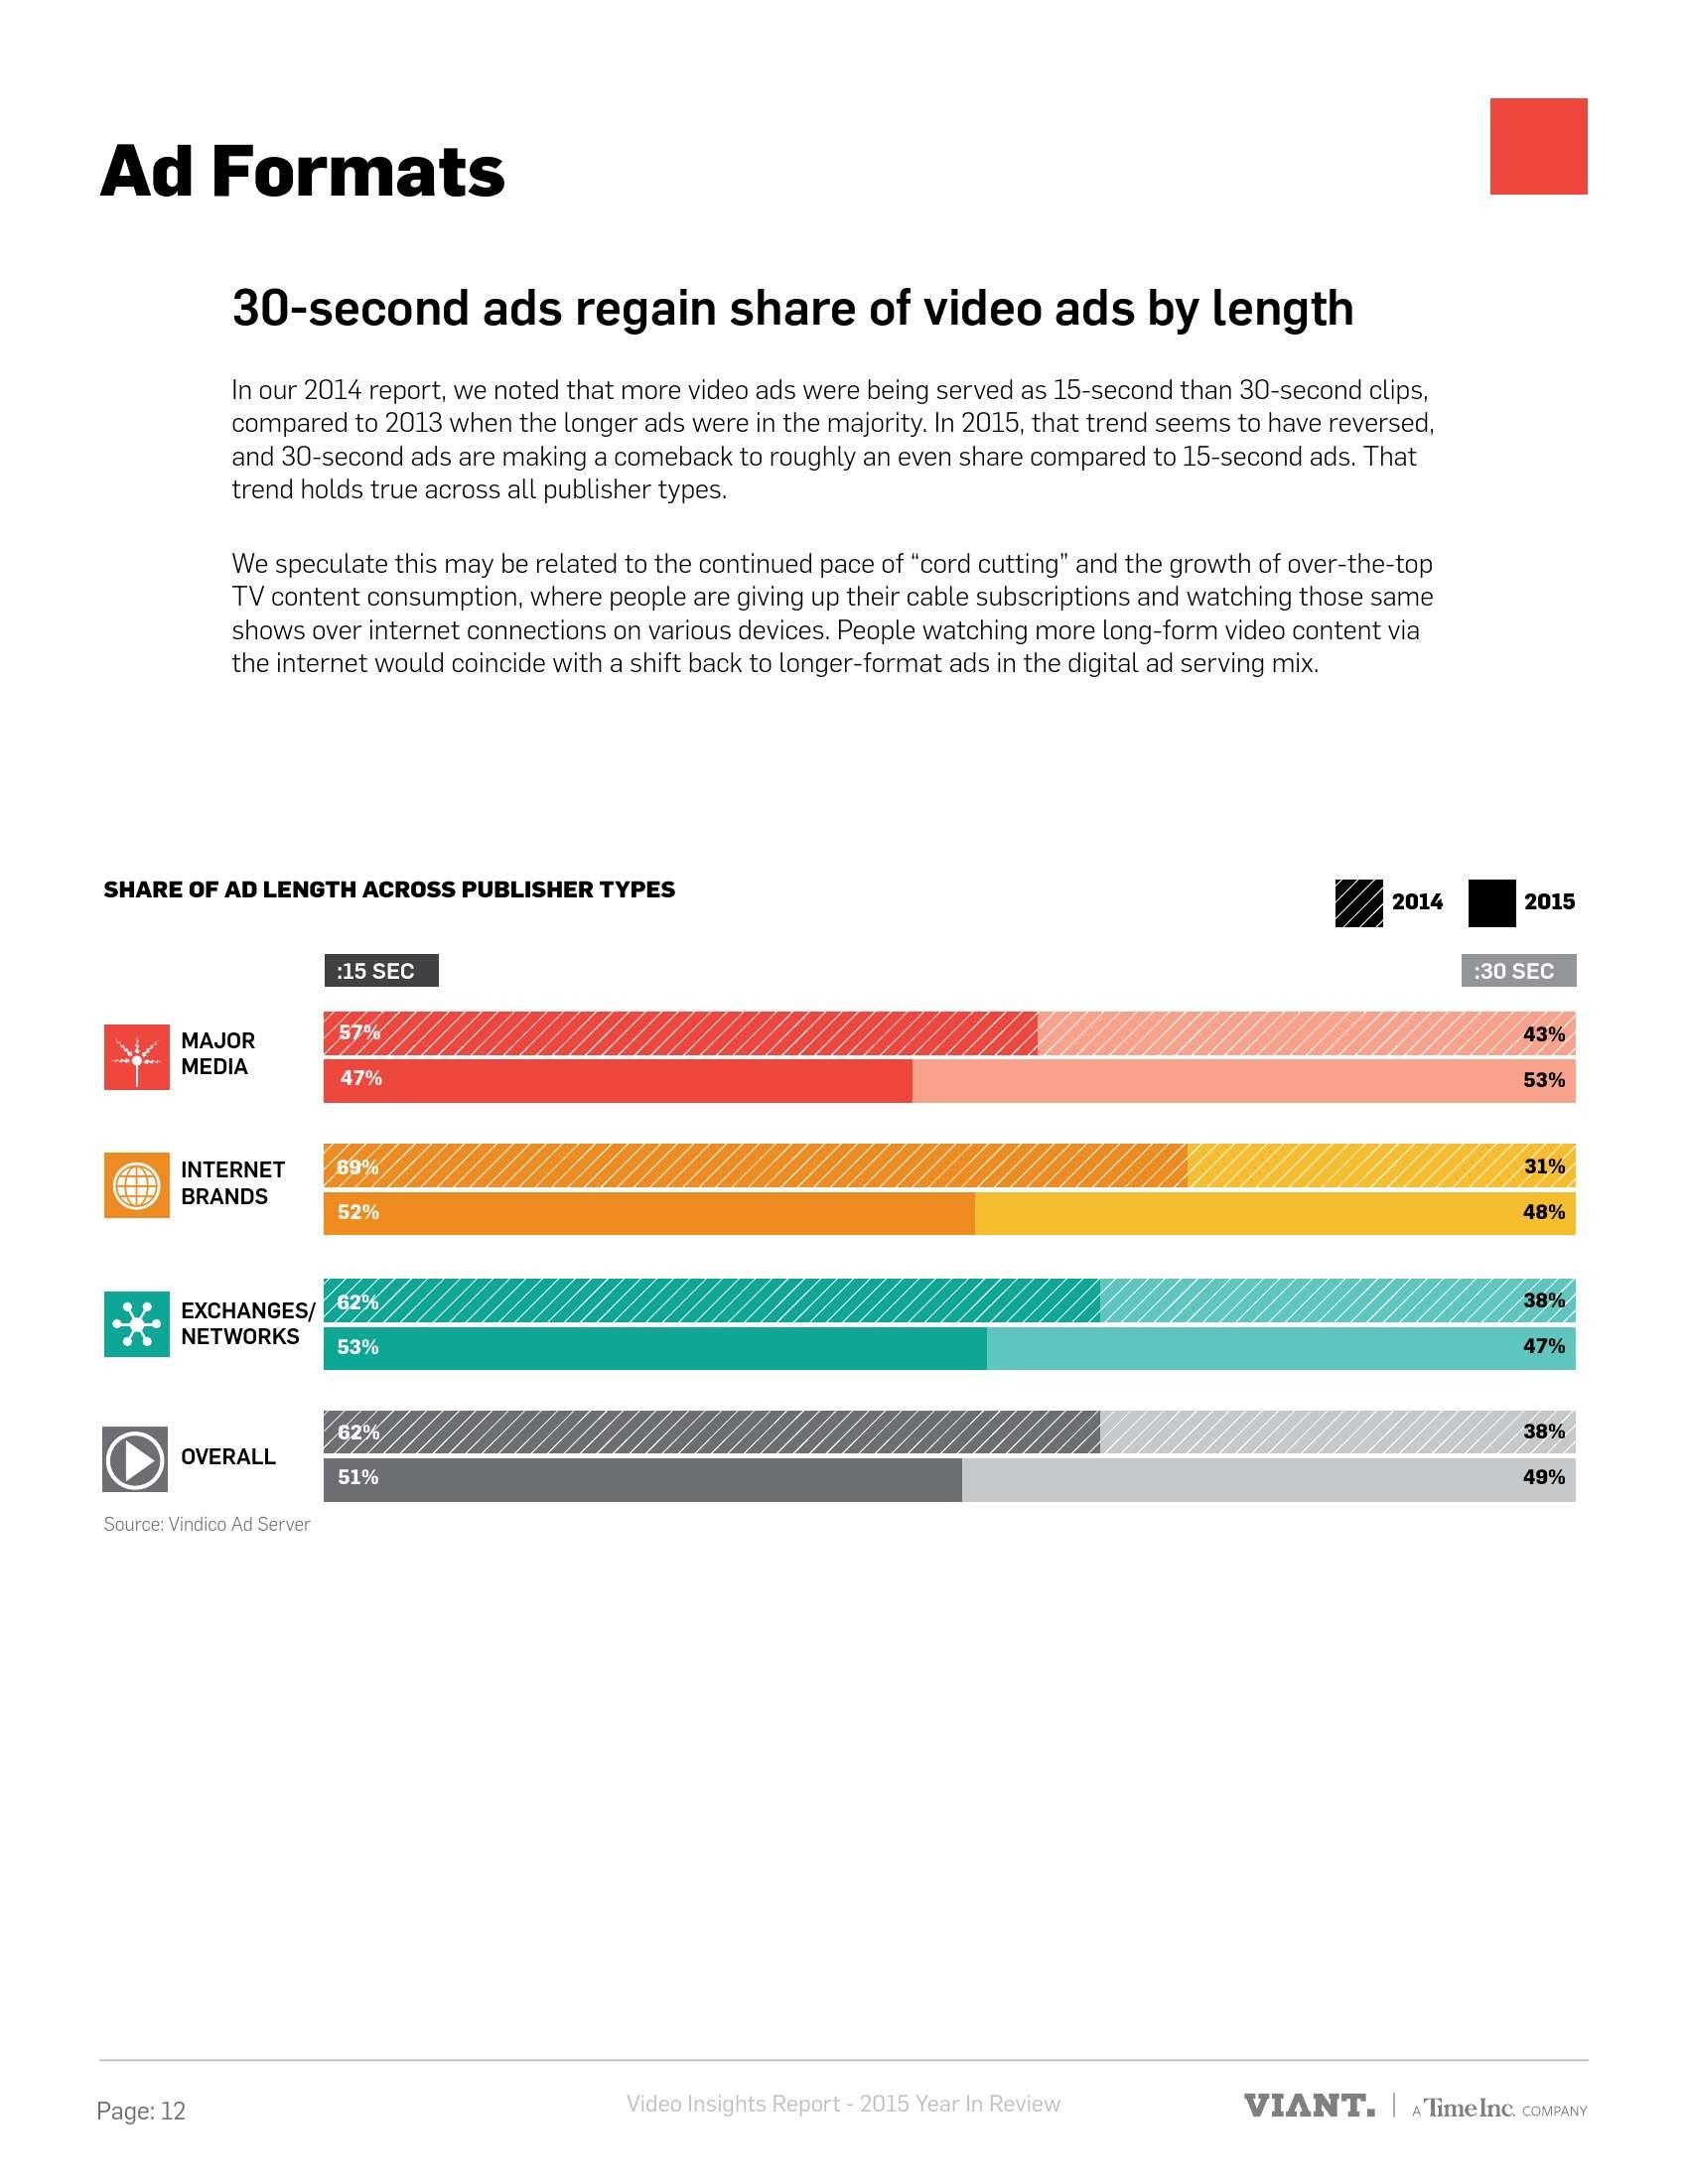 Viant:2015年视频广告趋势分析报告_000012